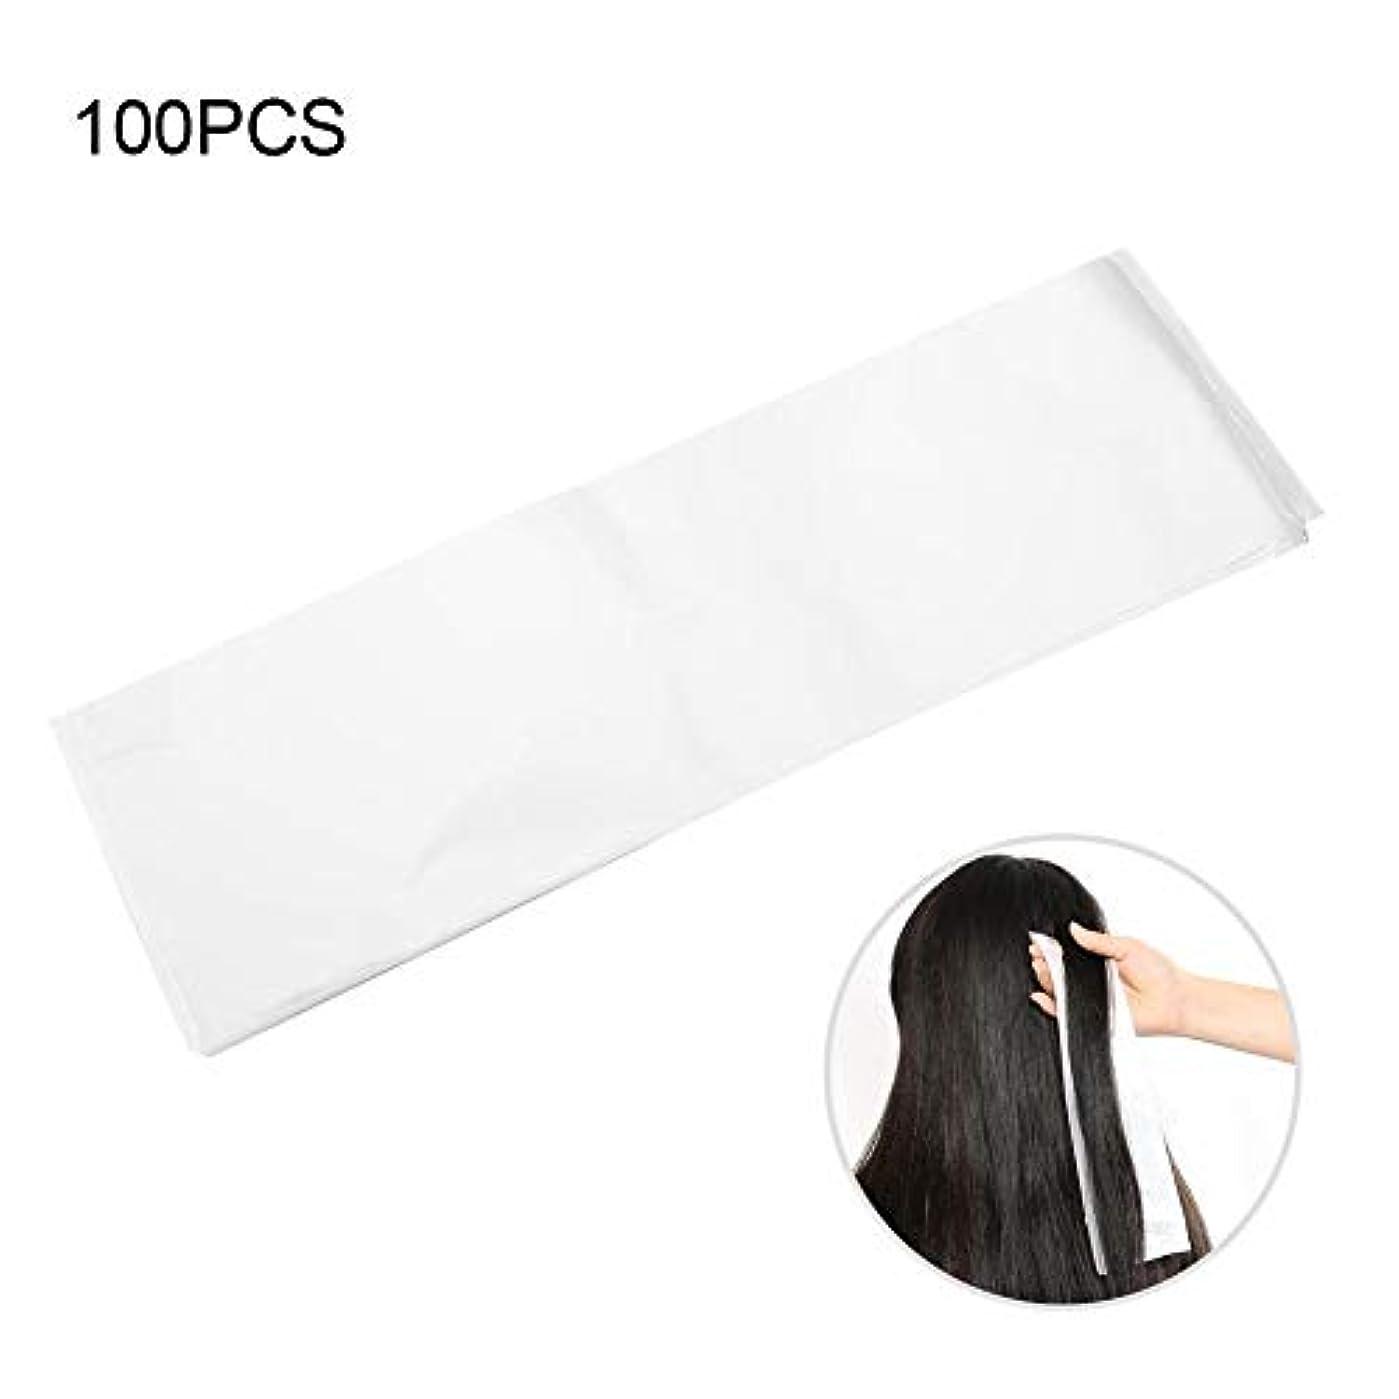 Semme染毛紙ヘアカラーリング紙、染色分離シート100ピース/パックプロフェッショナルサロン染毛紙再生利用可能染色カラーハイライトペーパー